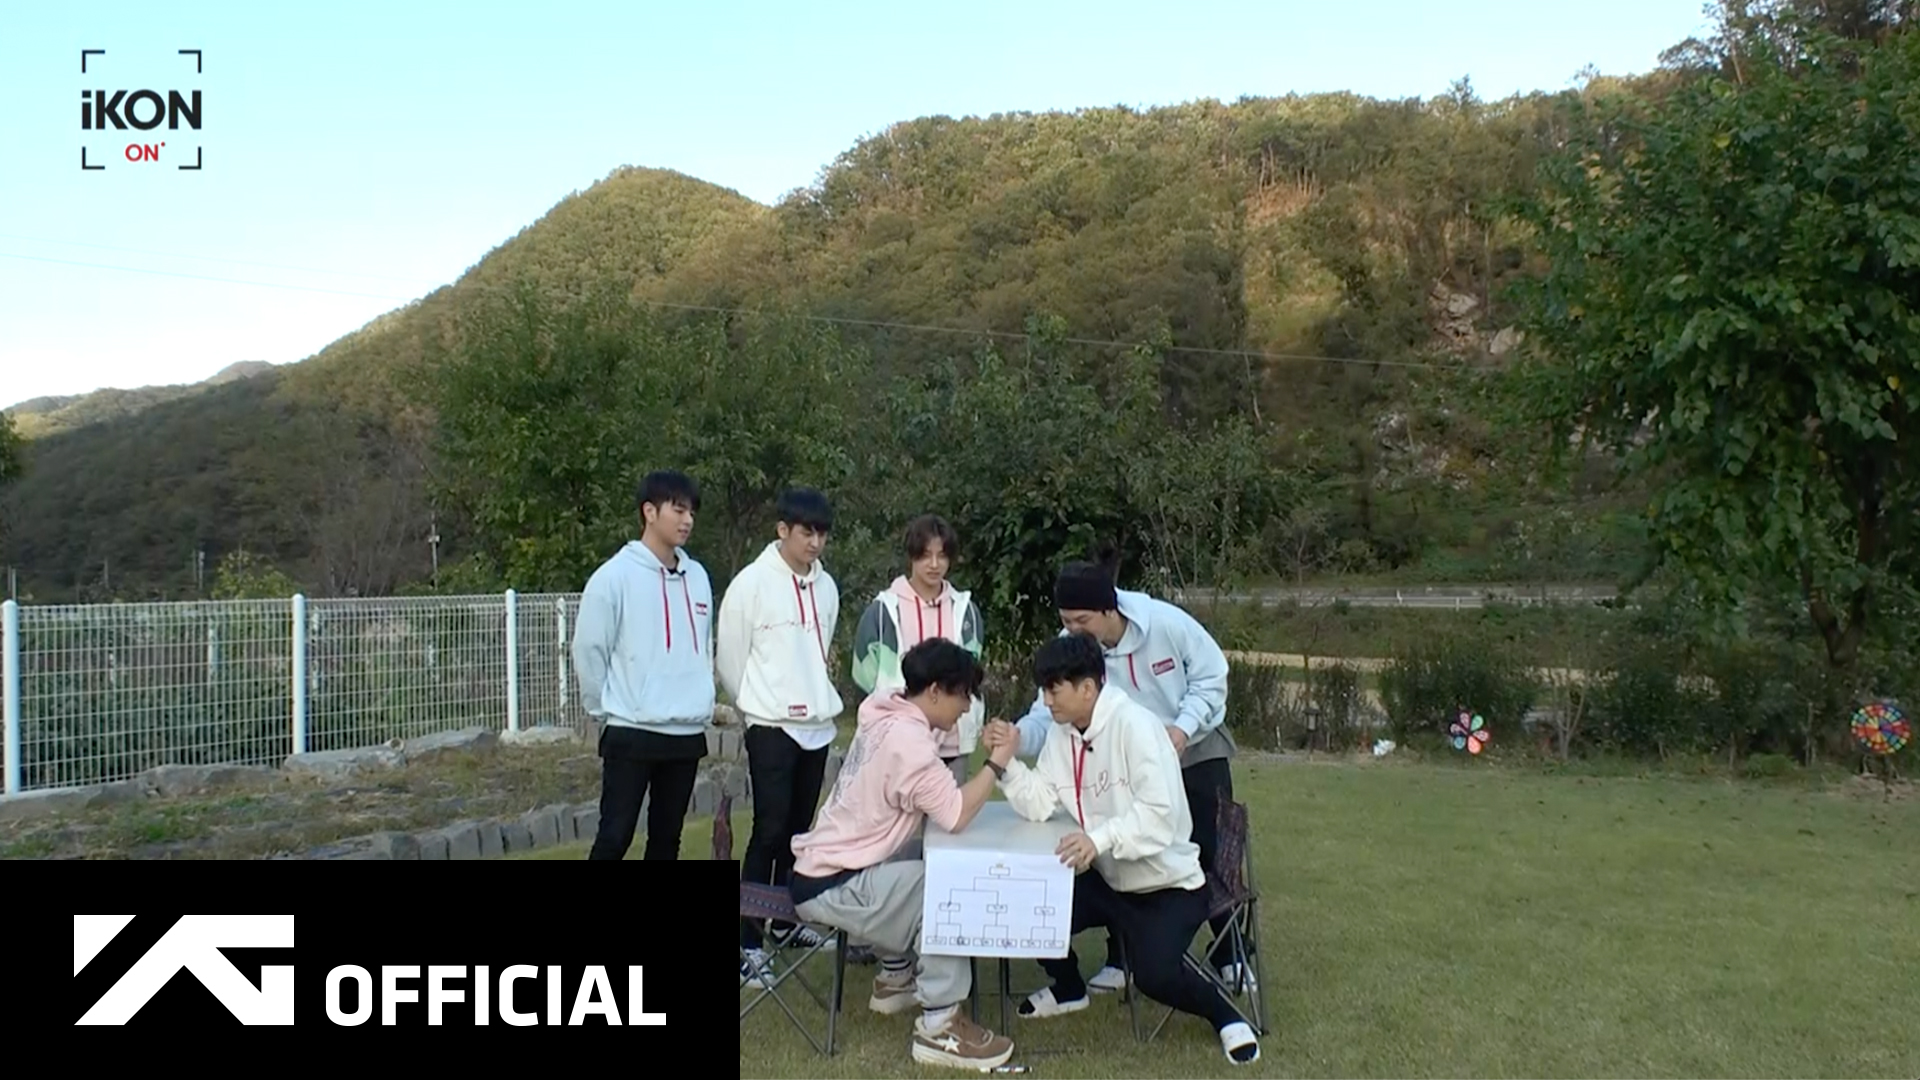 iKON-ON : KONY 1-DAY CAMPING EP.6 팔씨름 번외편